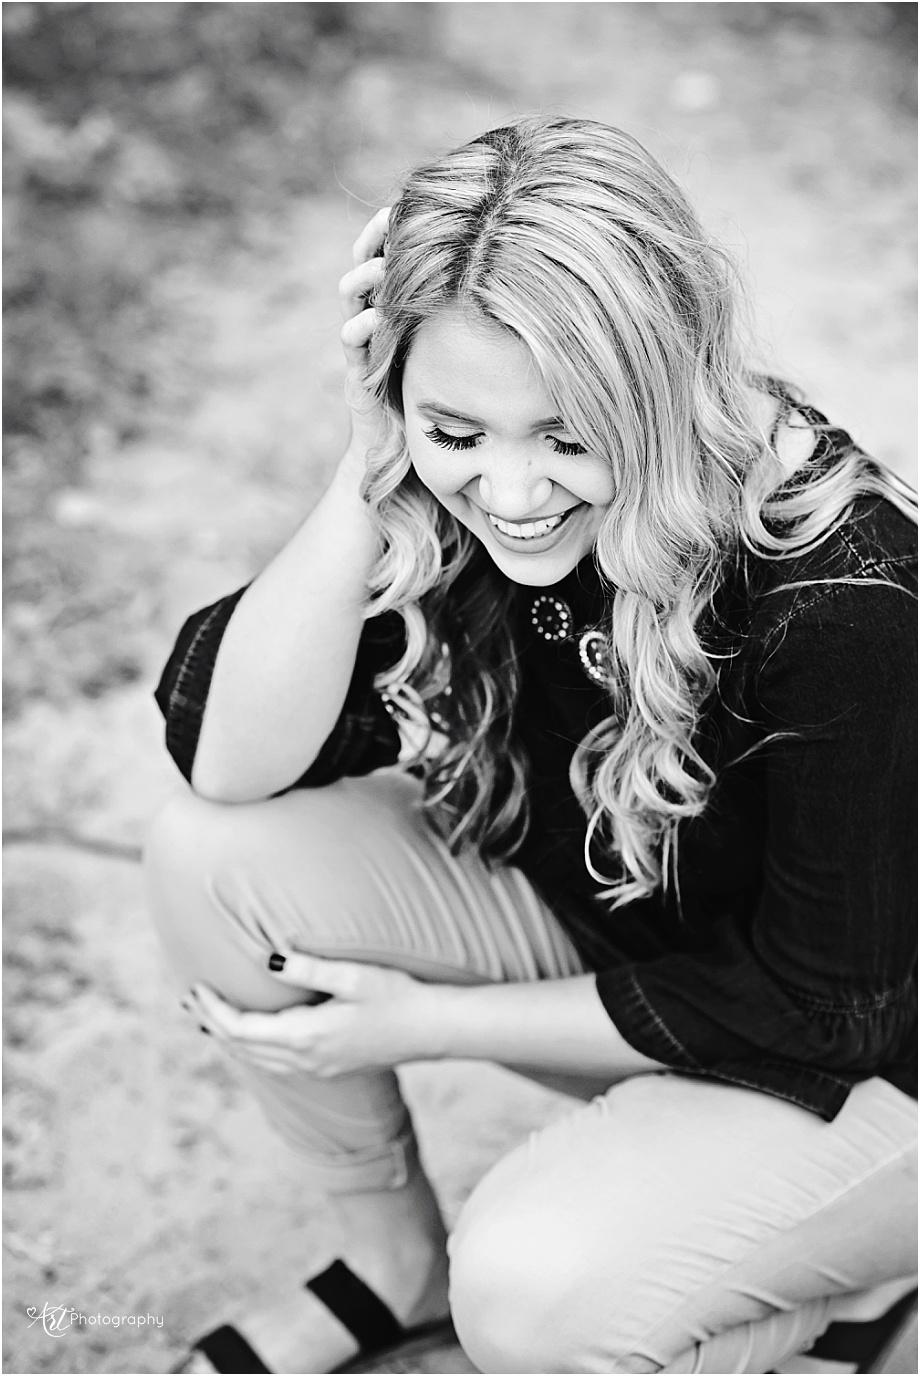 ART Photography - Phoenix, Surprise, West Valley High School